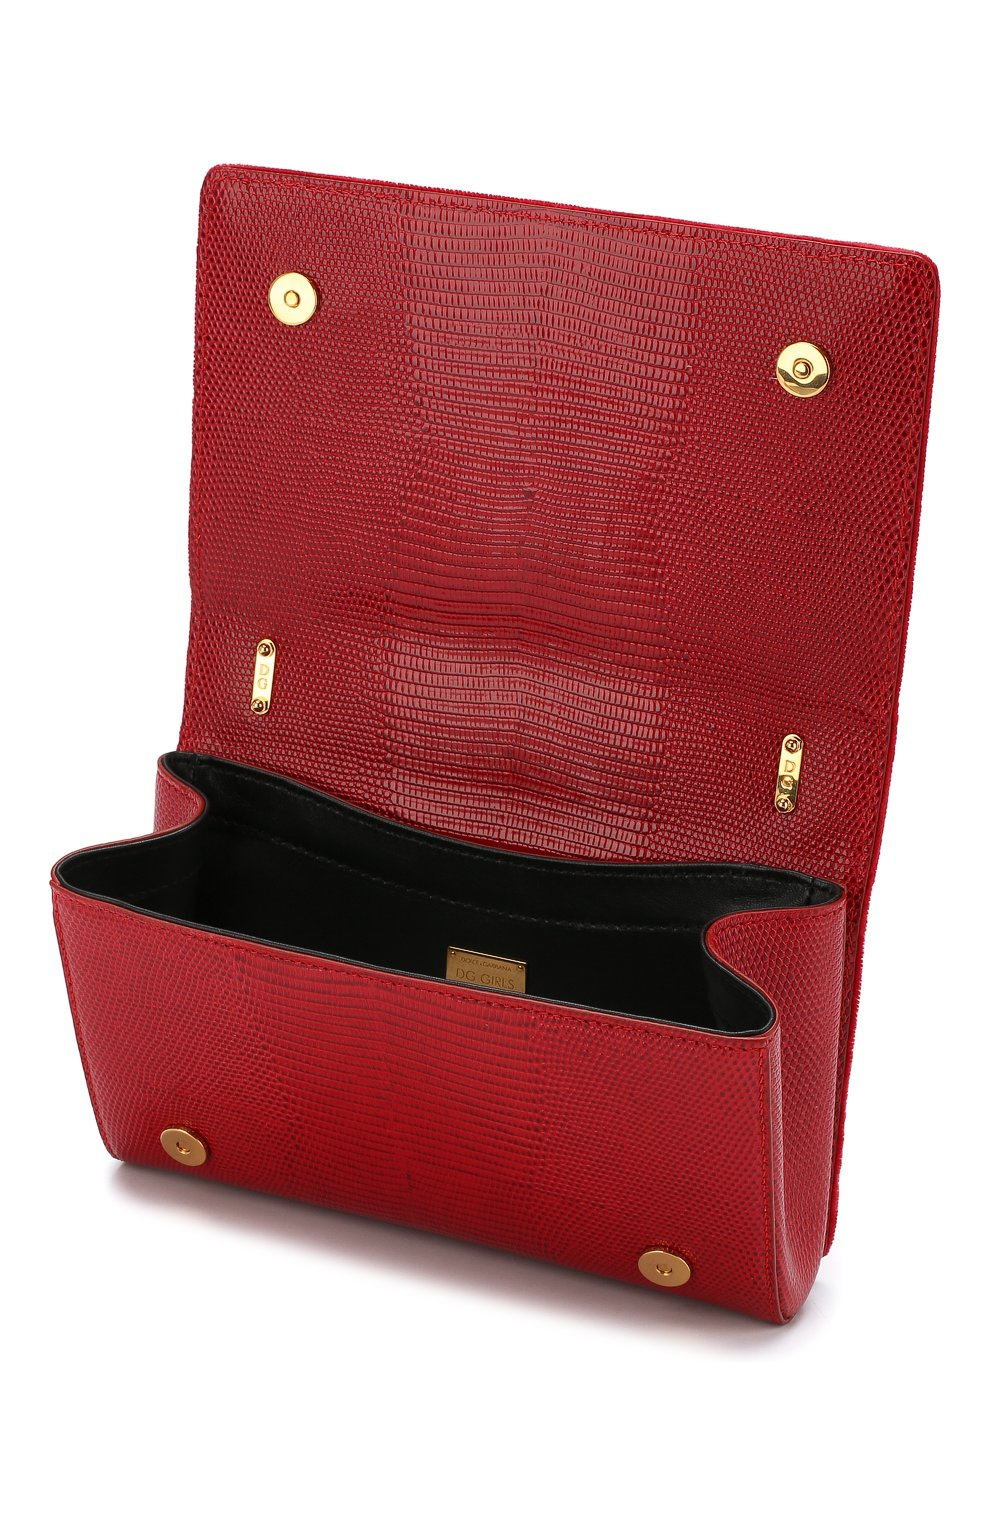 Сумка DG Girls из бархата Dolce & Gabbana красная цвета | Фото №4